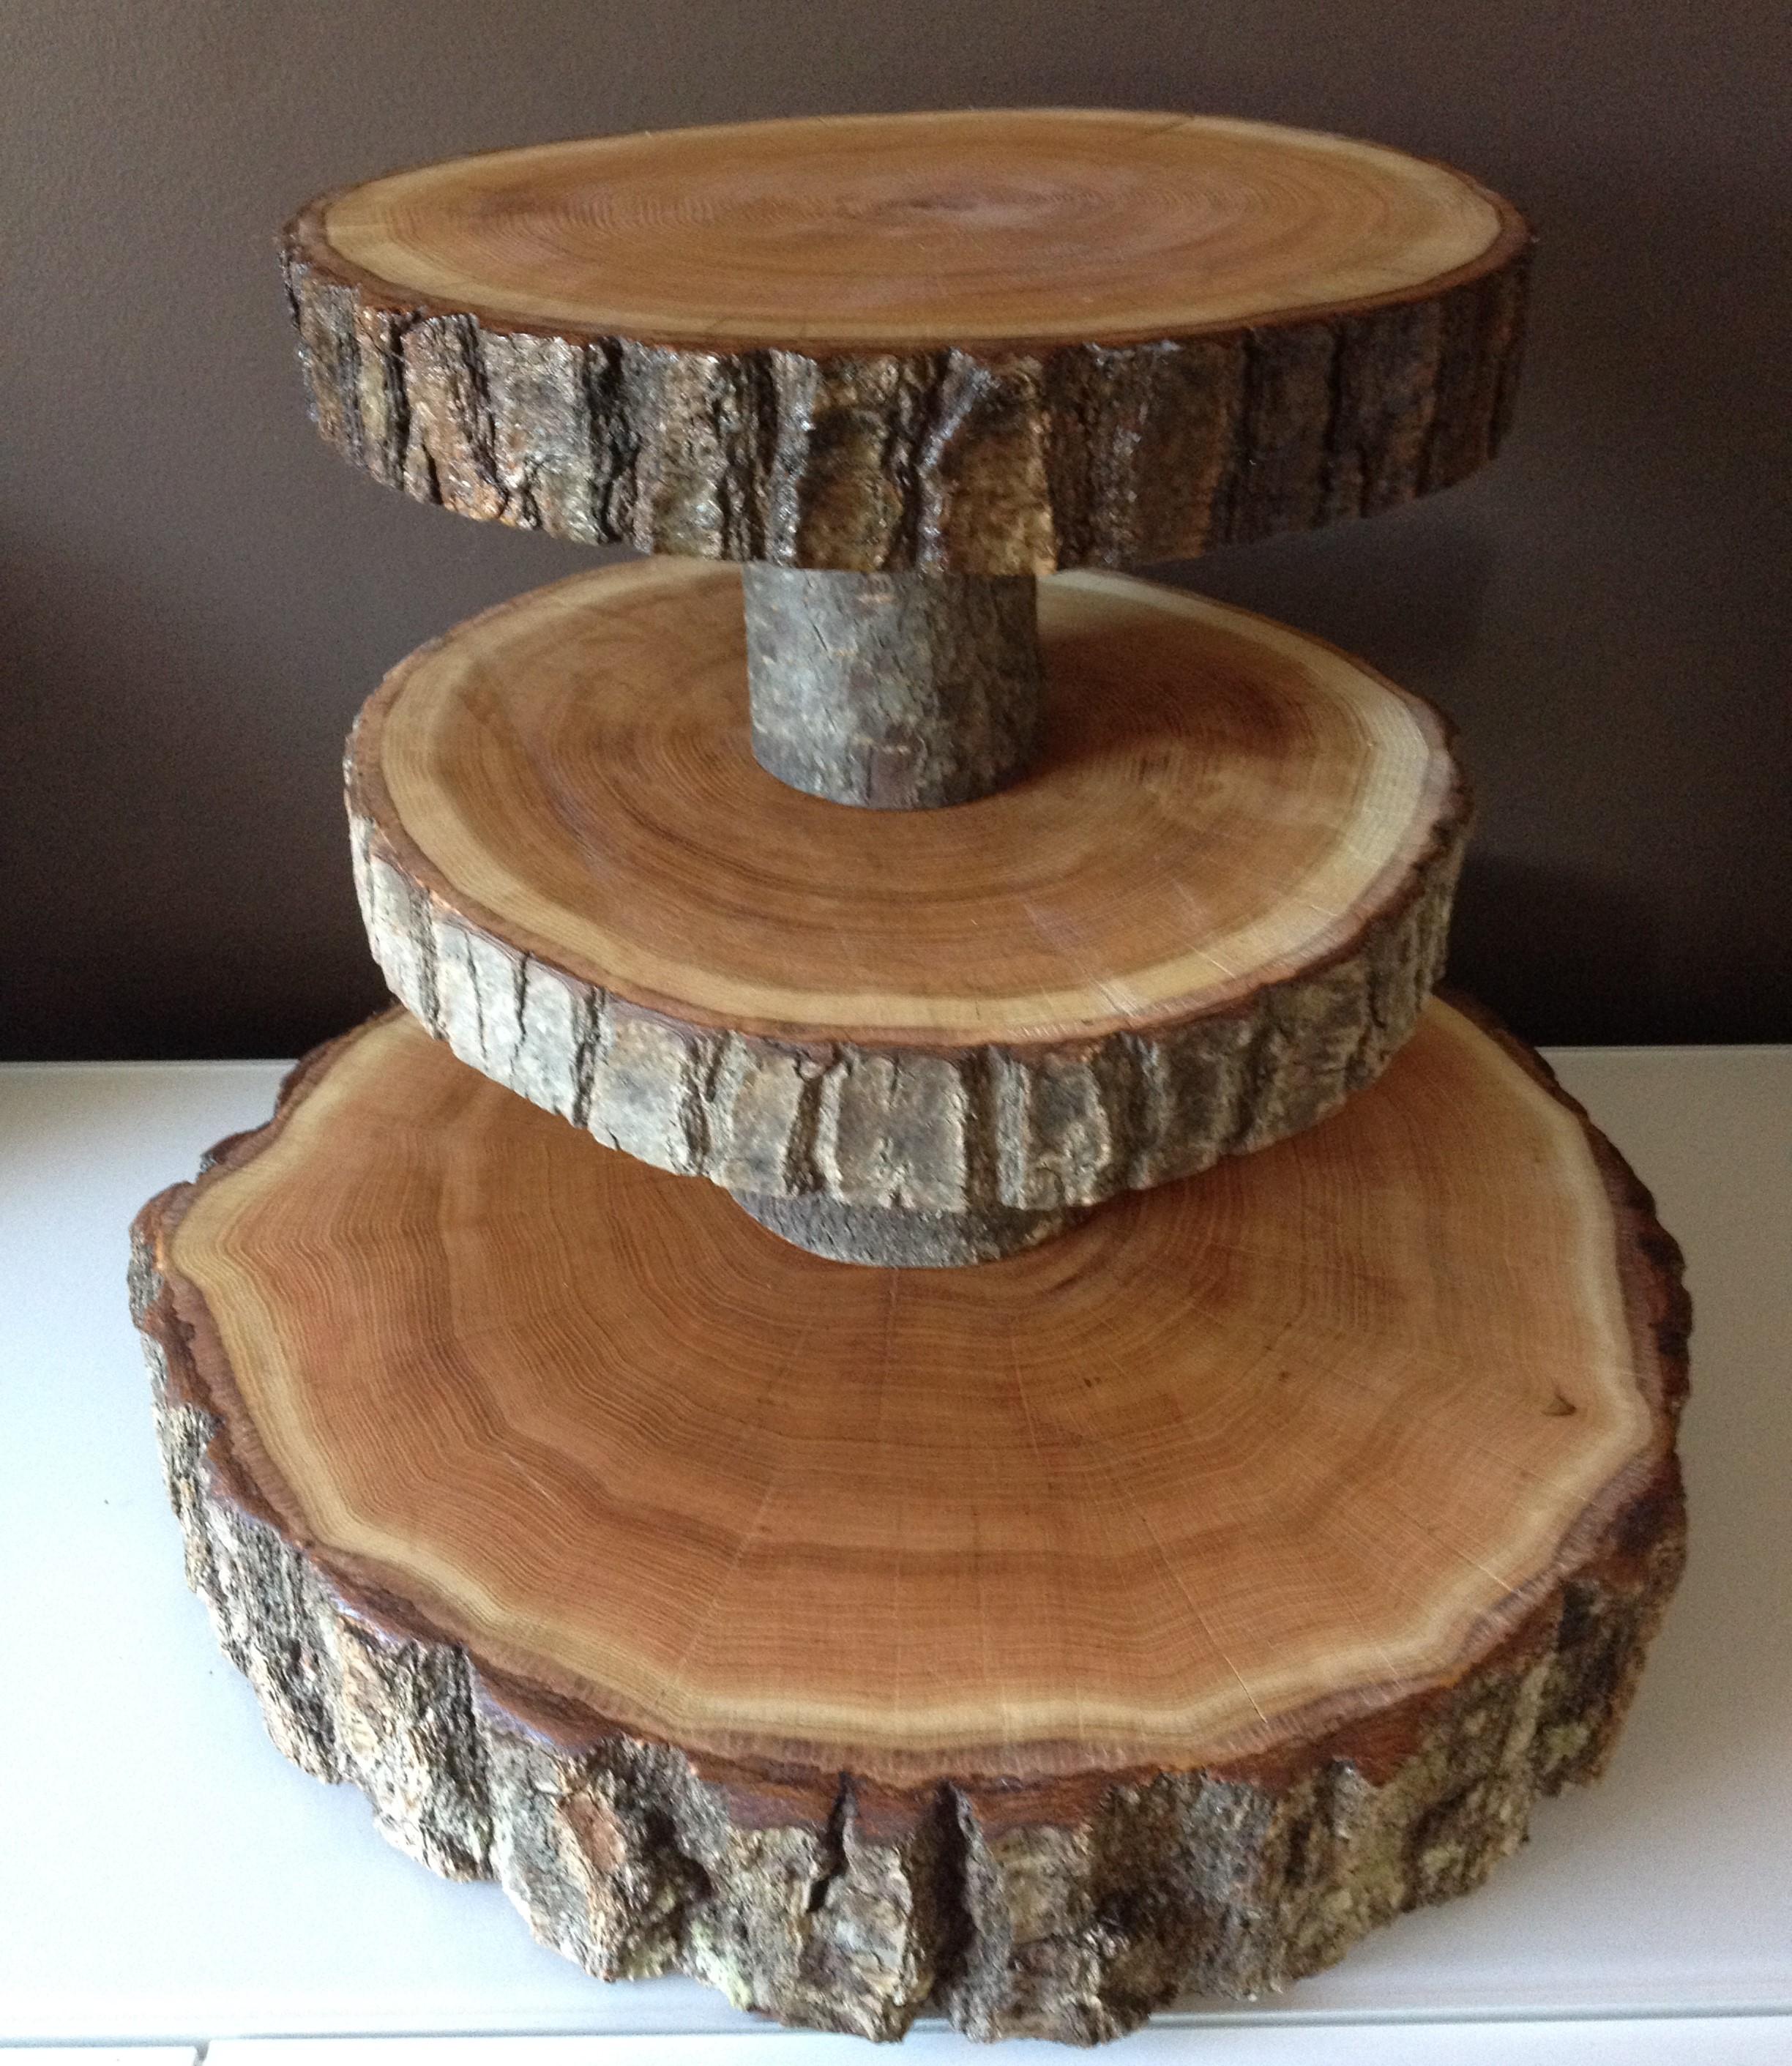 wood slice wedding cake stands wood rounds stump cake stand. Black Bedroom Furniture Sets. Home Design Ideas